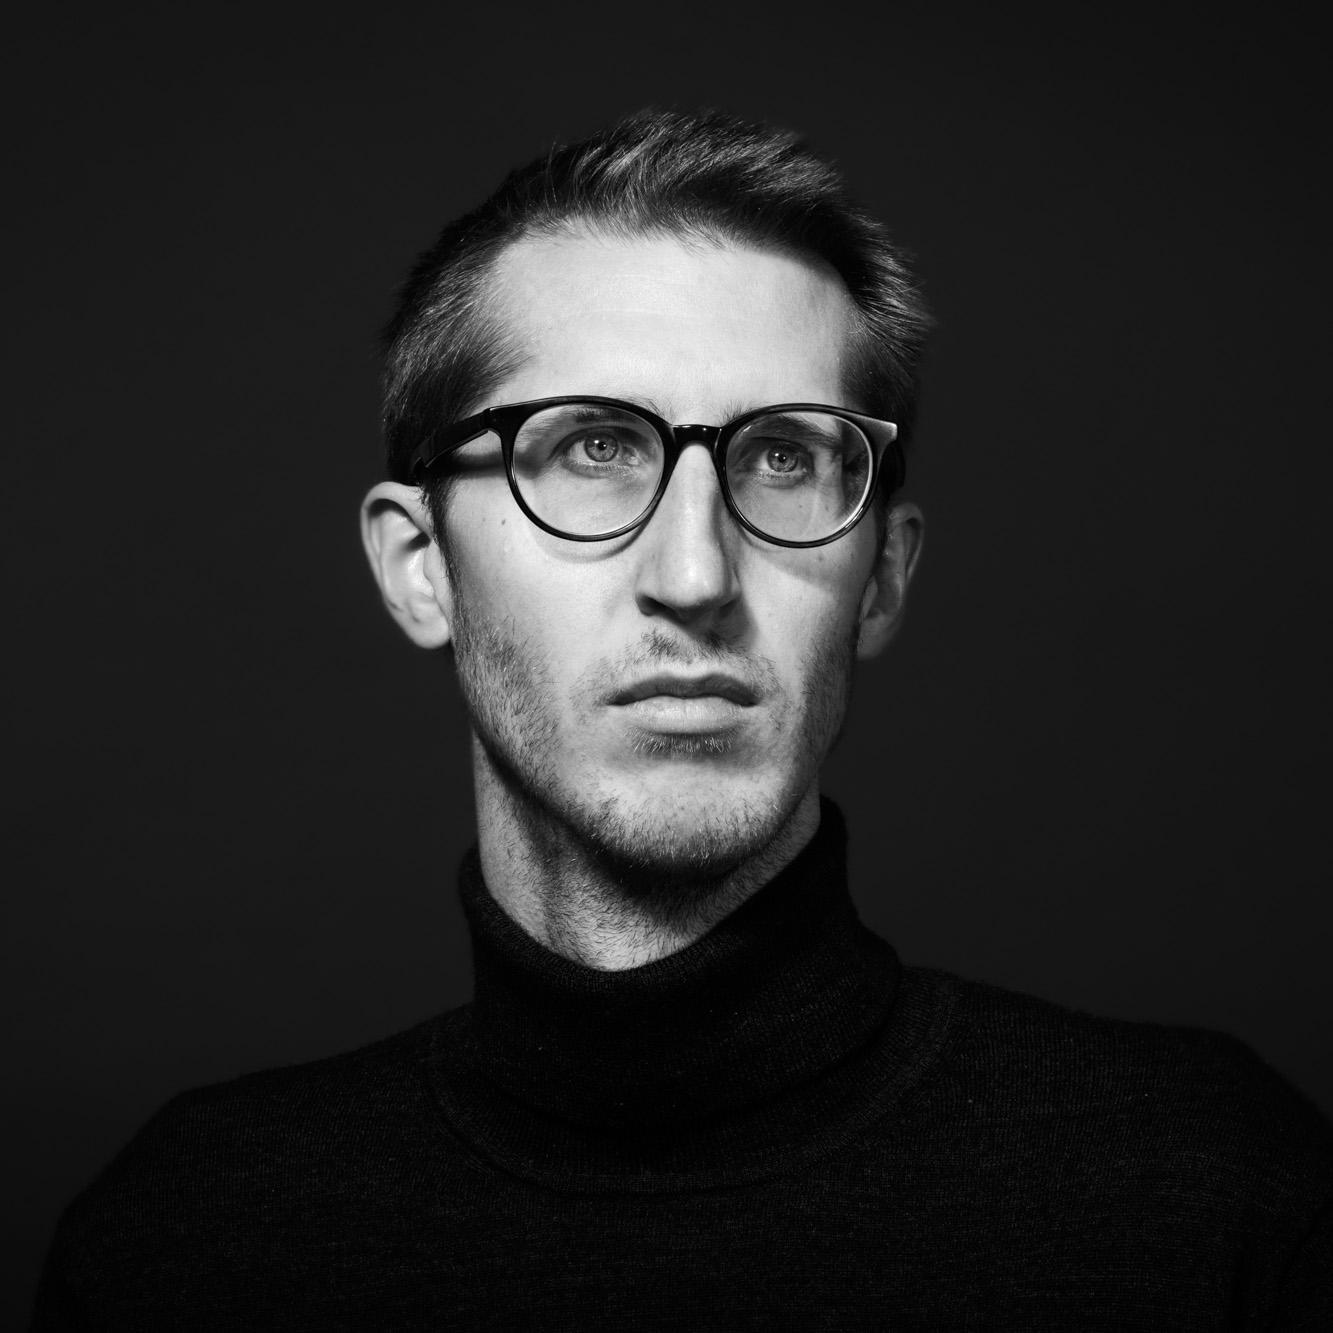 Matthieu Corpataux @ Nicolas Brodard